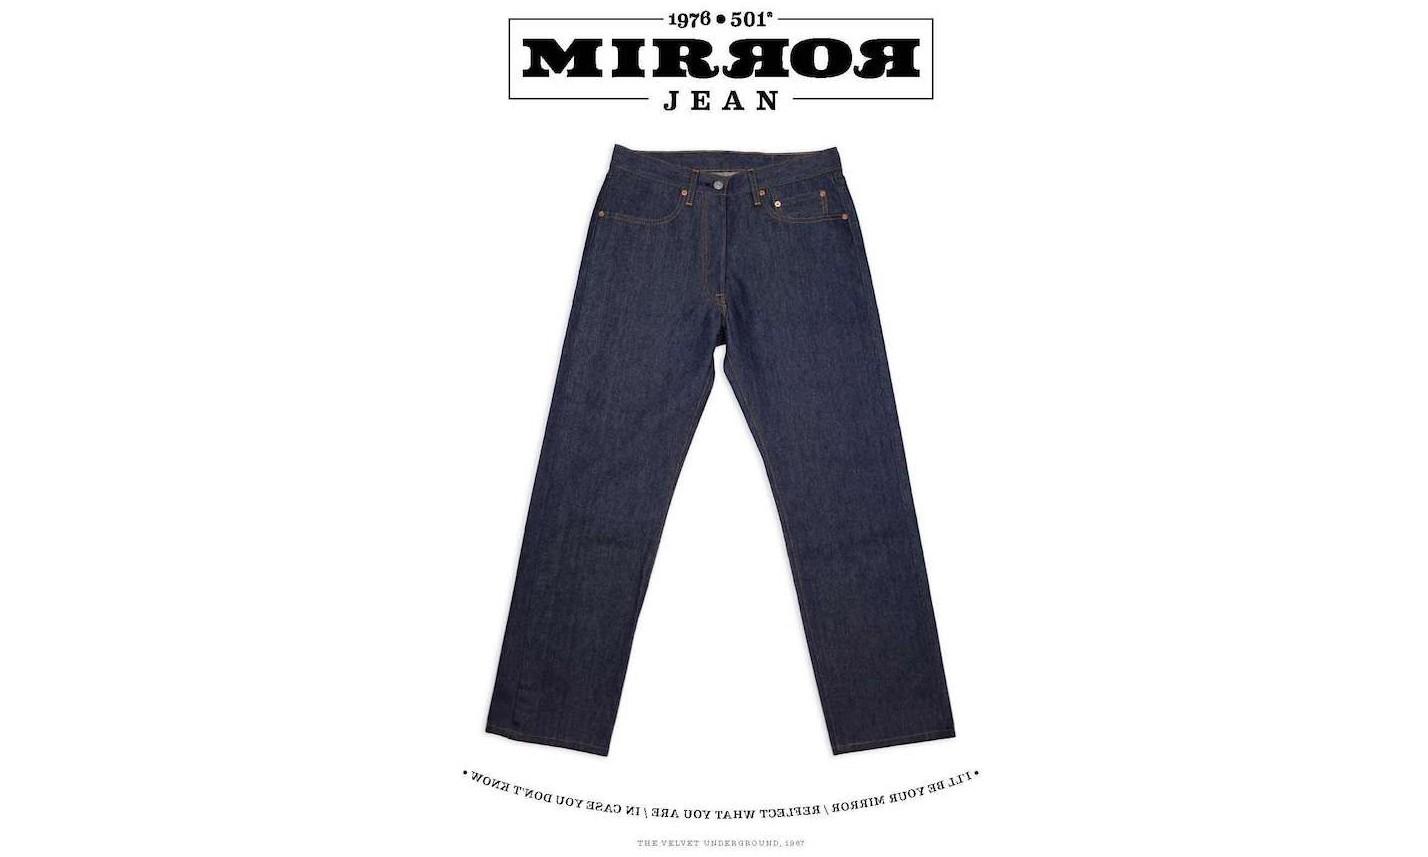 镜像设计,Levi's Vintage Clothing 推出 1976 501 Mirror Jean